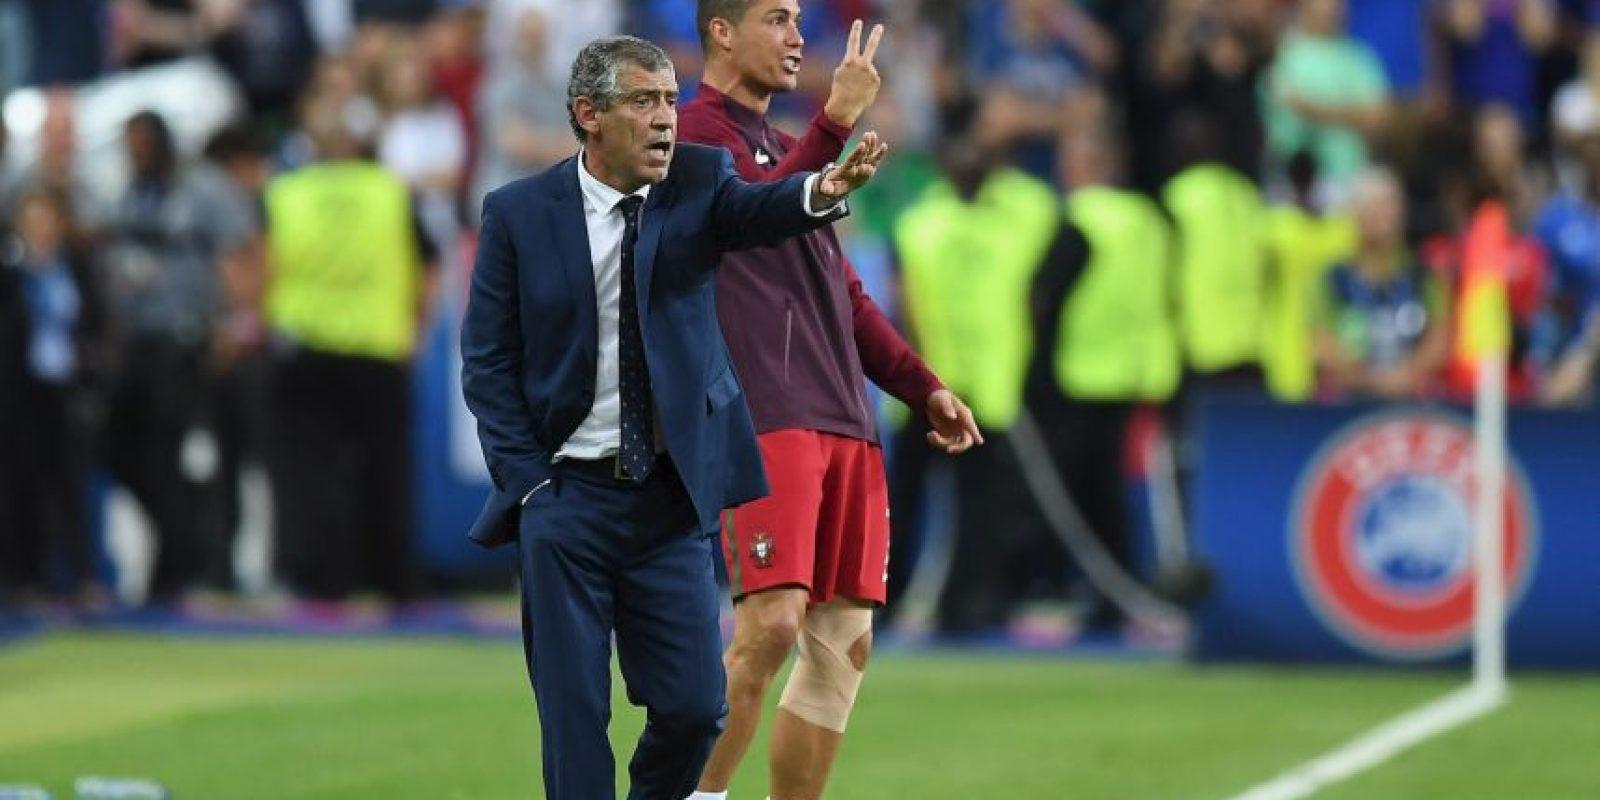 Un lesionado Cristiano Ronaldo sufrió al borde de la cancha Foto:Getty Images